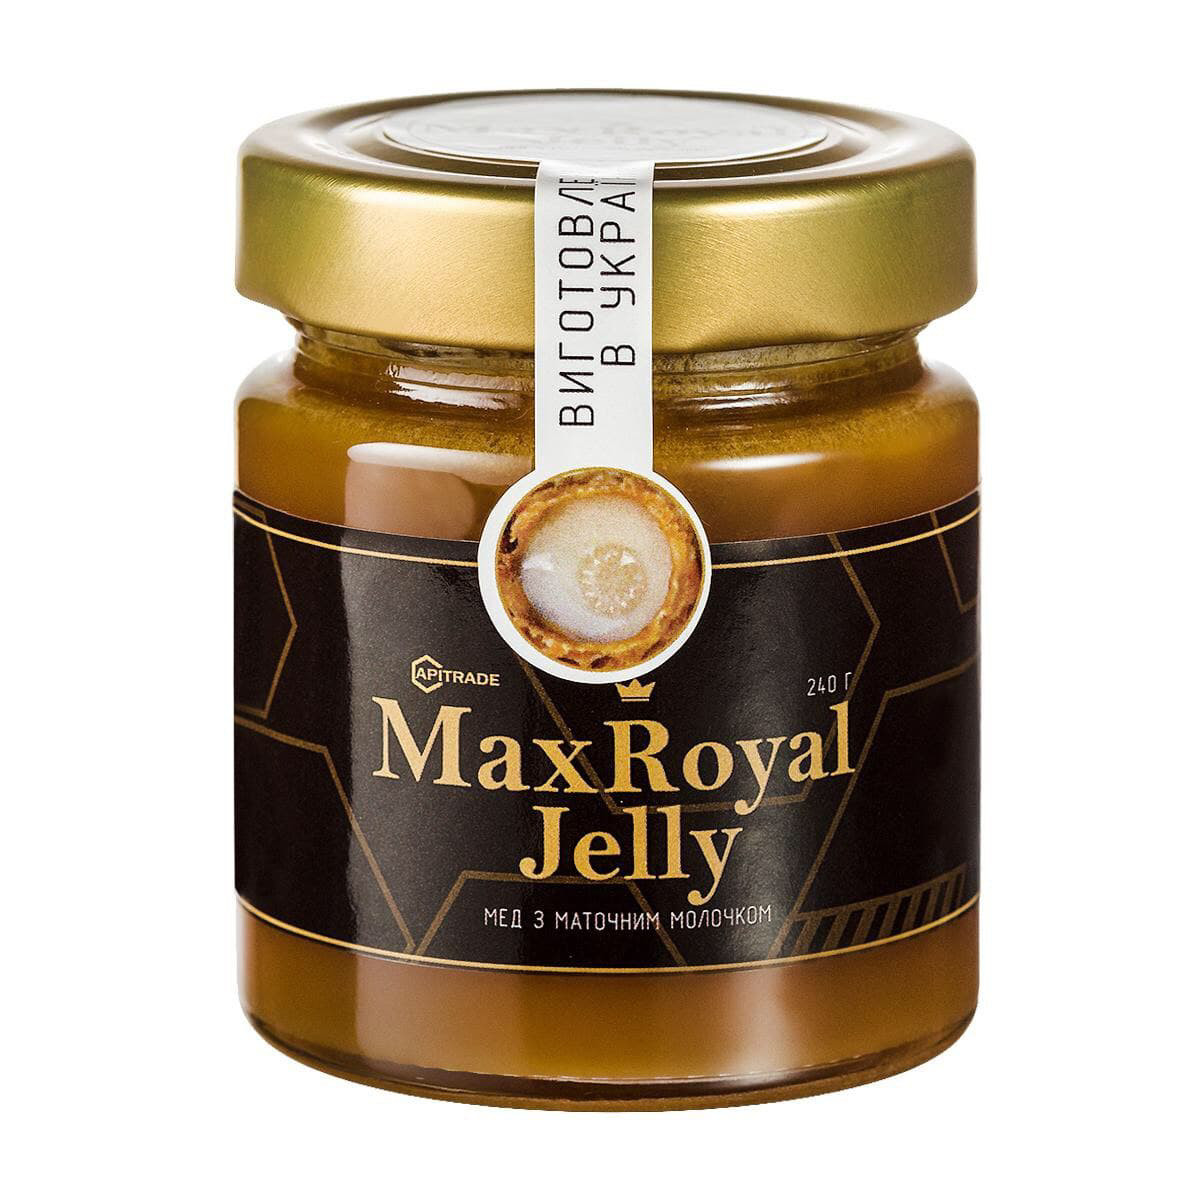 Max Royal Jelly 240 г